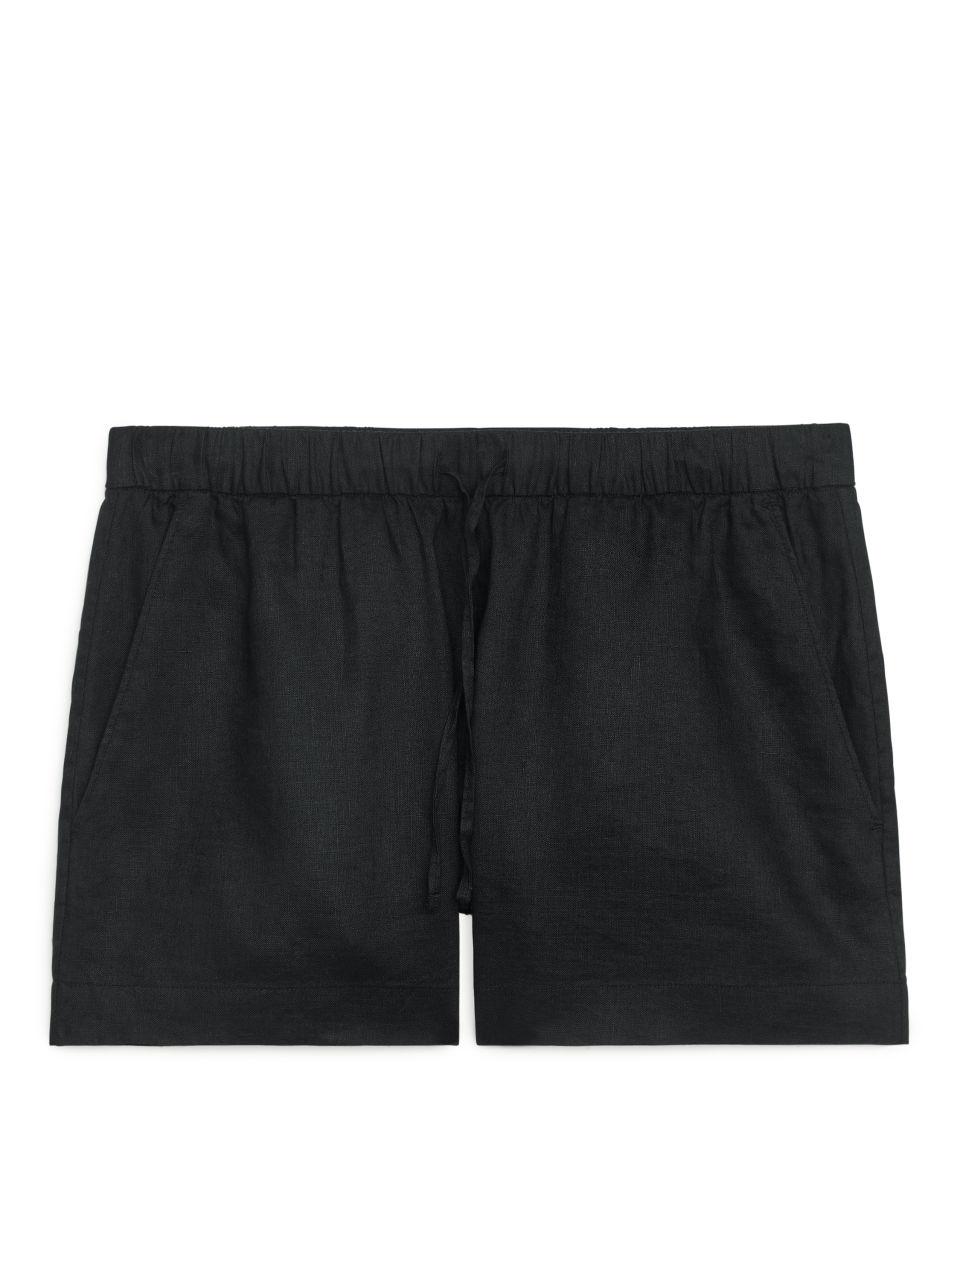 Linen Shorts - Black